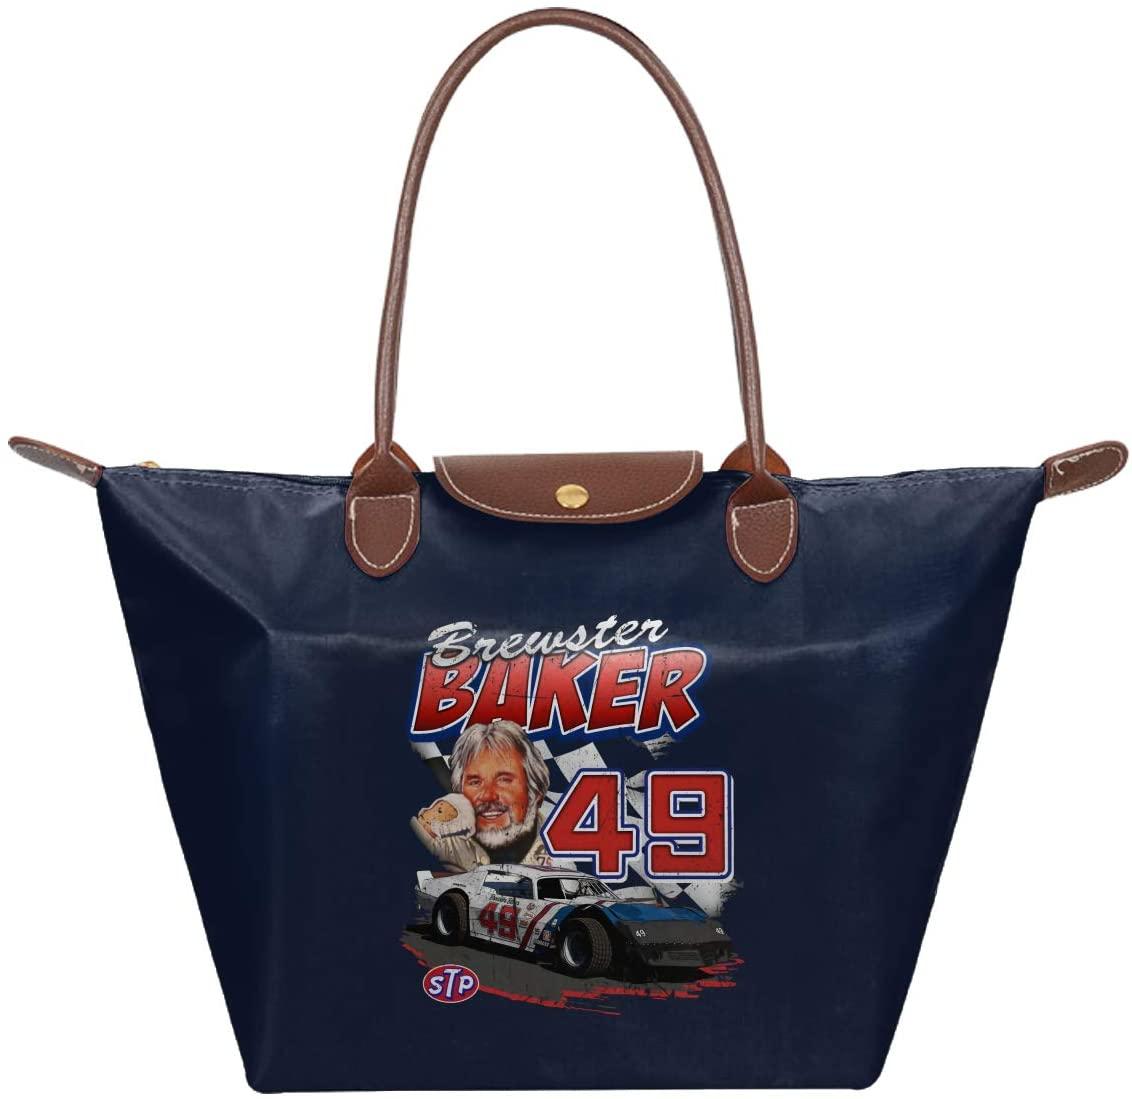 Ssxvjaioervrf Kenny Rogers Waterproof Zipper Tote Bag Handbag Nylon Shoulder Shopping Fold Bag Navy